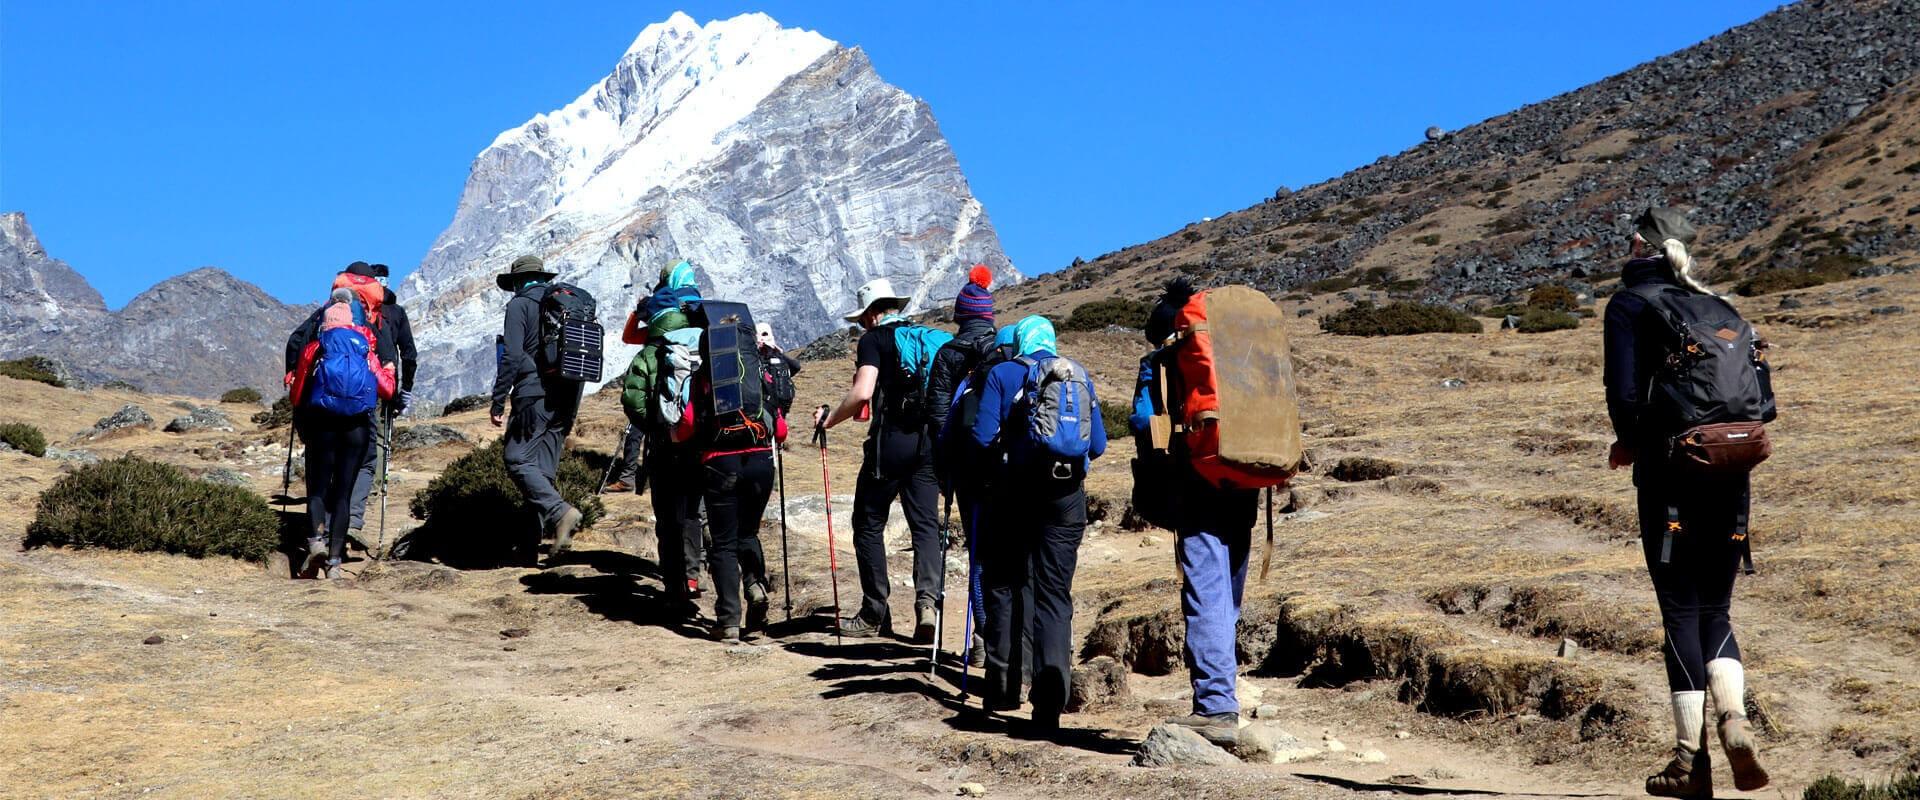 Short Everest Base Camp Trek - 10 Days